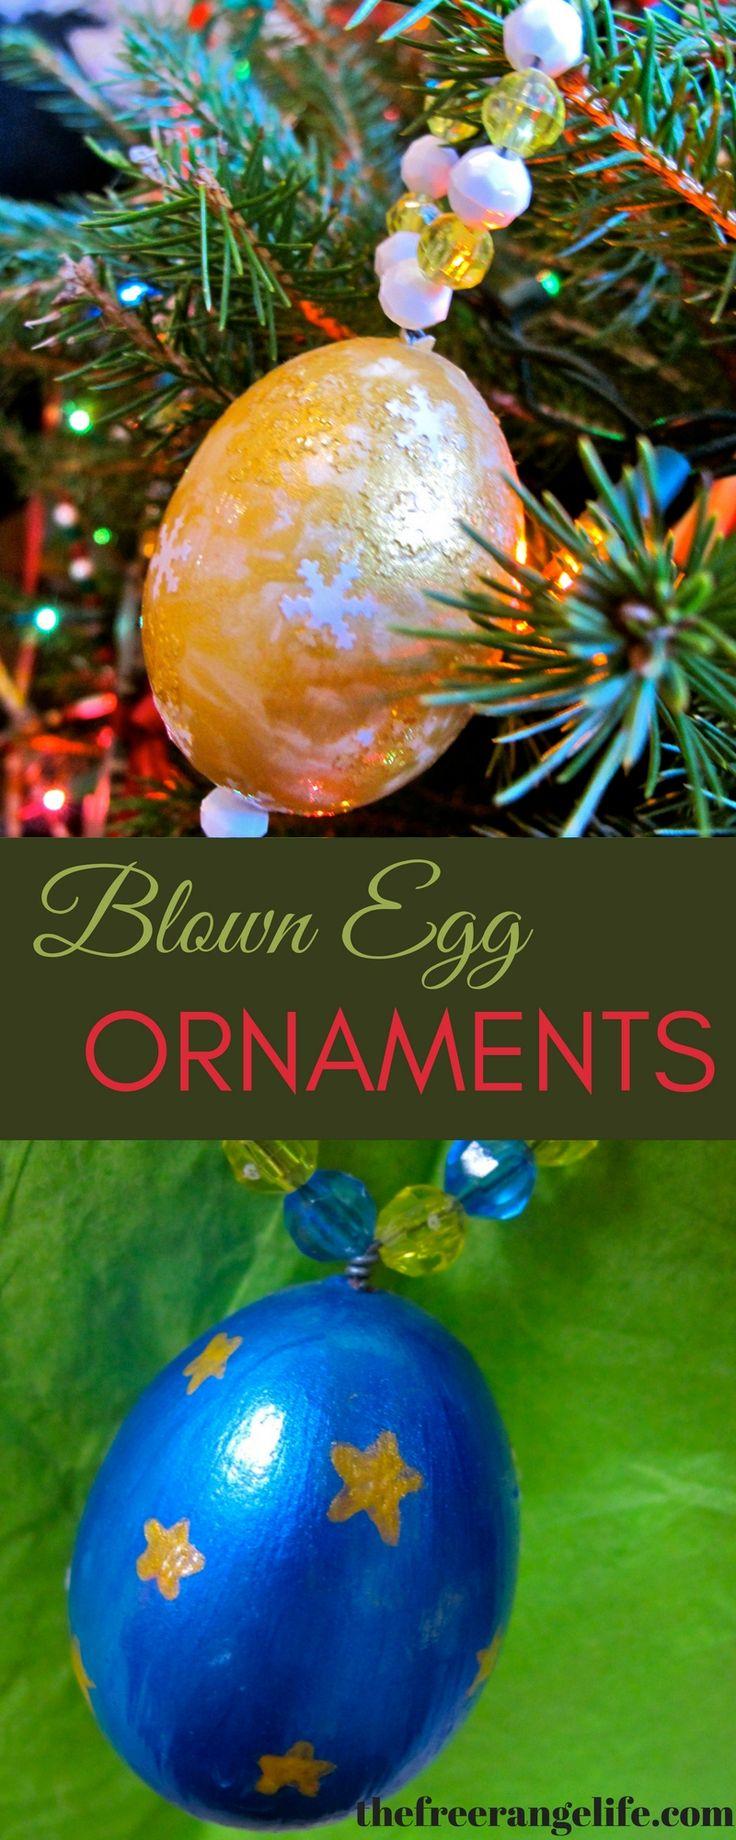 Homemade Homestead Christmas: Egg Ornaments